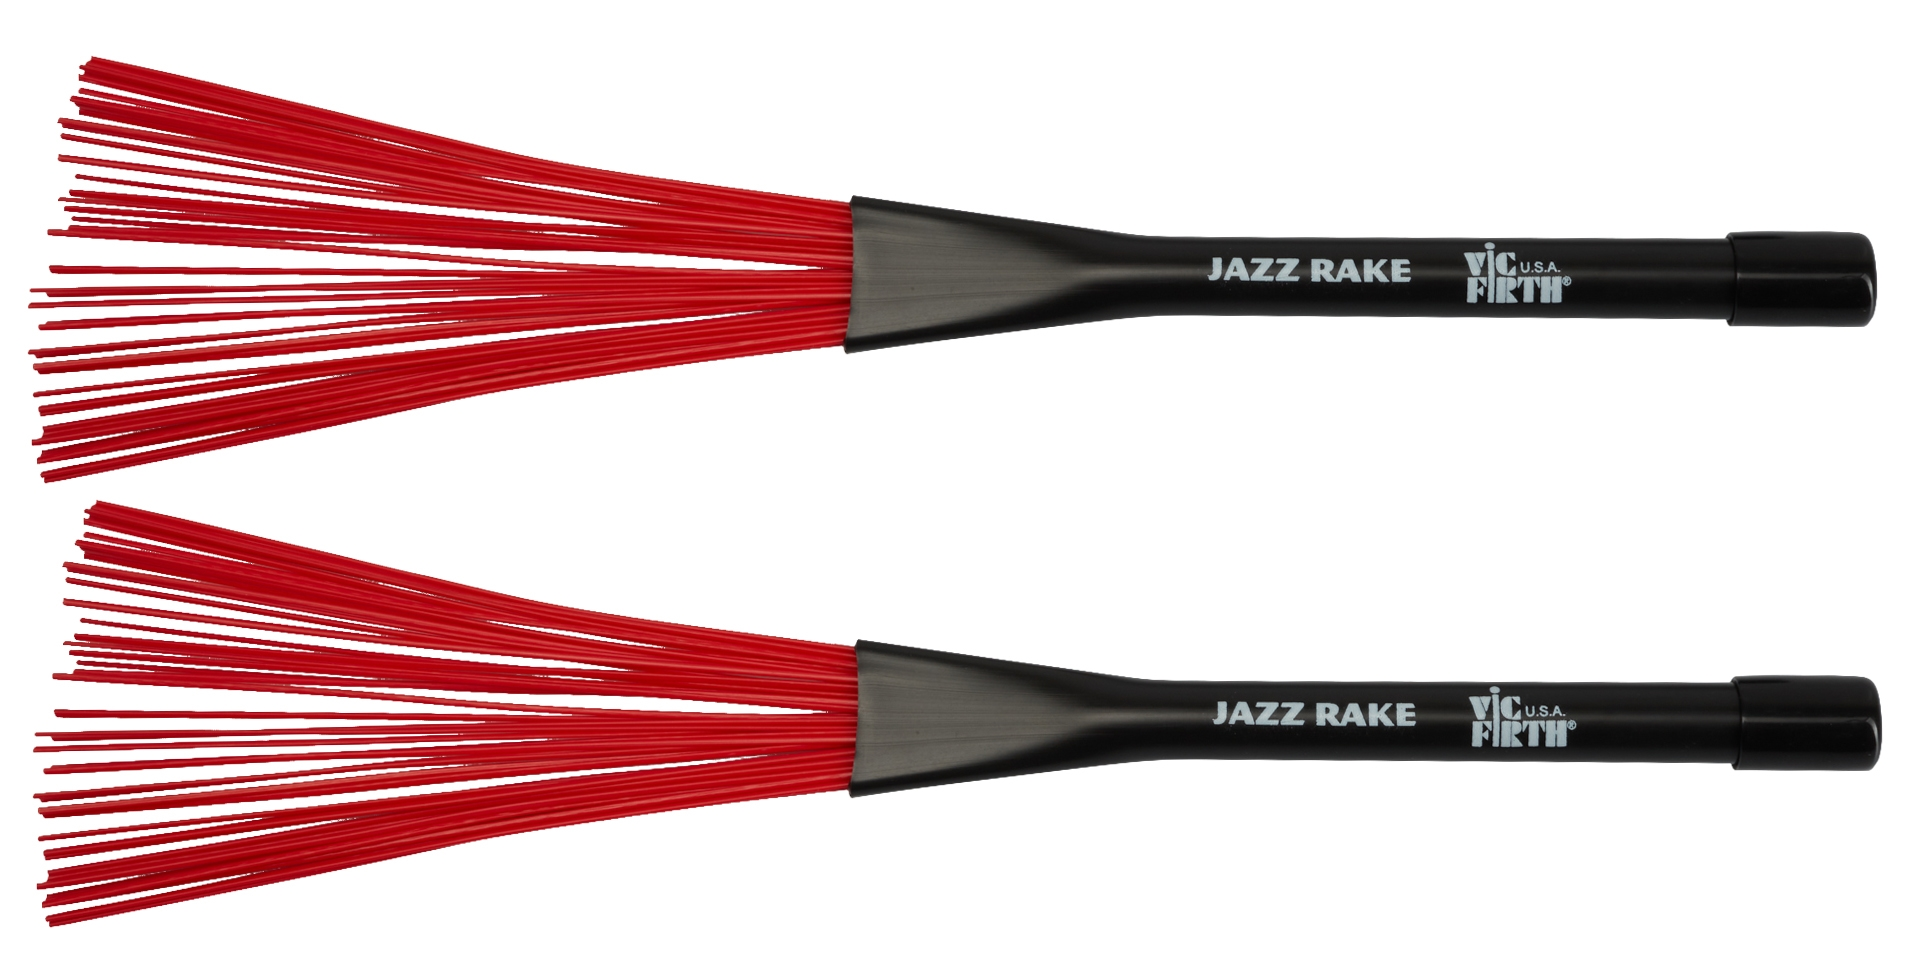 VIC FIRTH BJR Jazz Rake